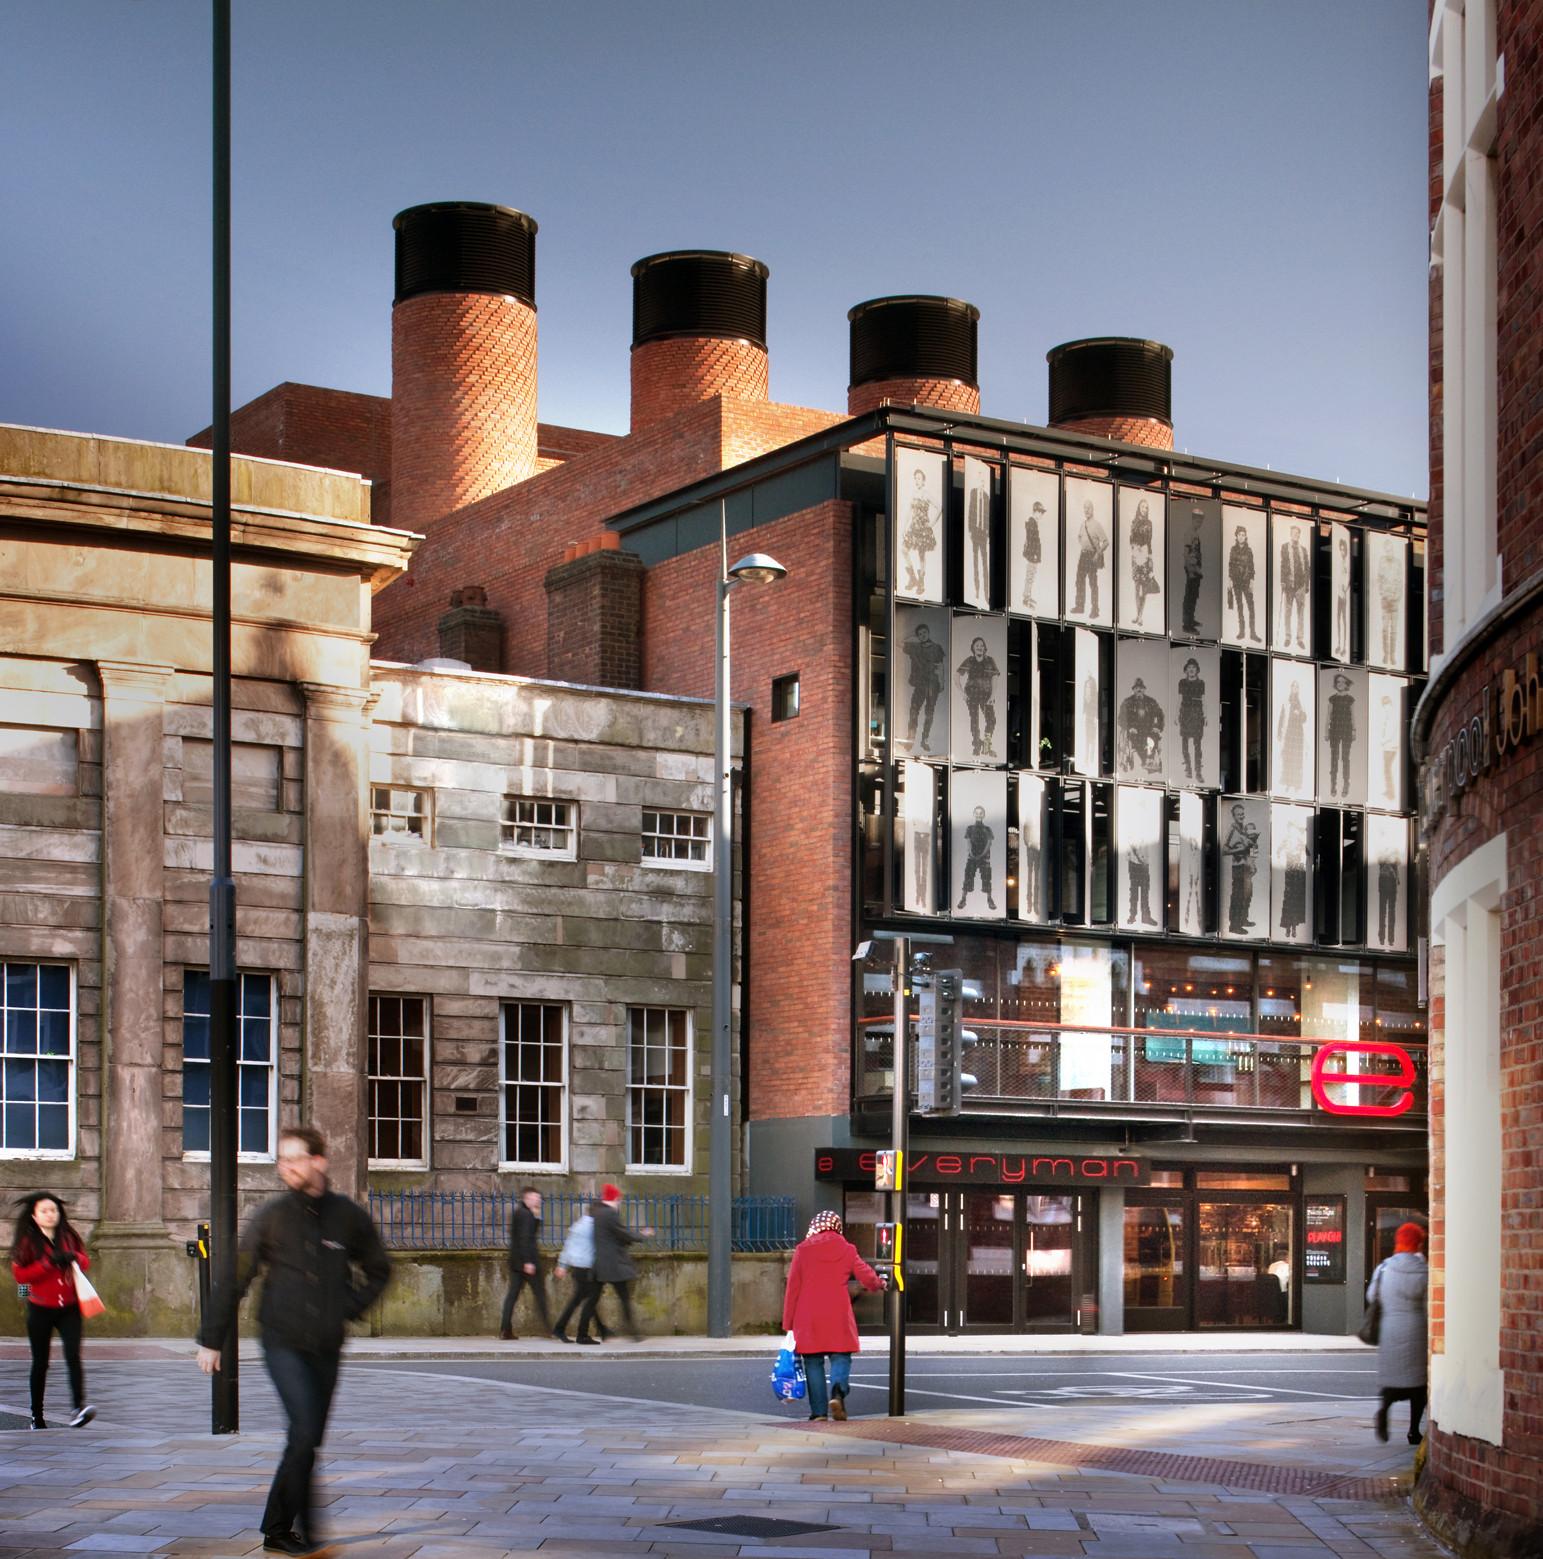 Haworth Tompkins: Who Are The 2014 RIBA Stirling Prize Winners?, Everyman Theatre, Liverpool. Image © Philip Vile